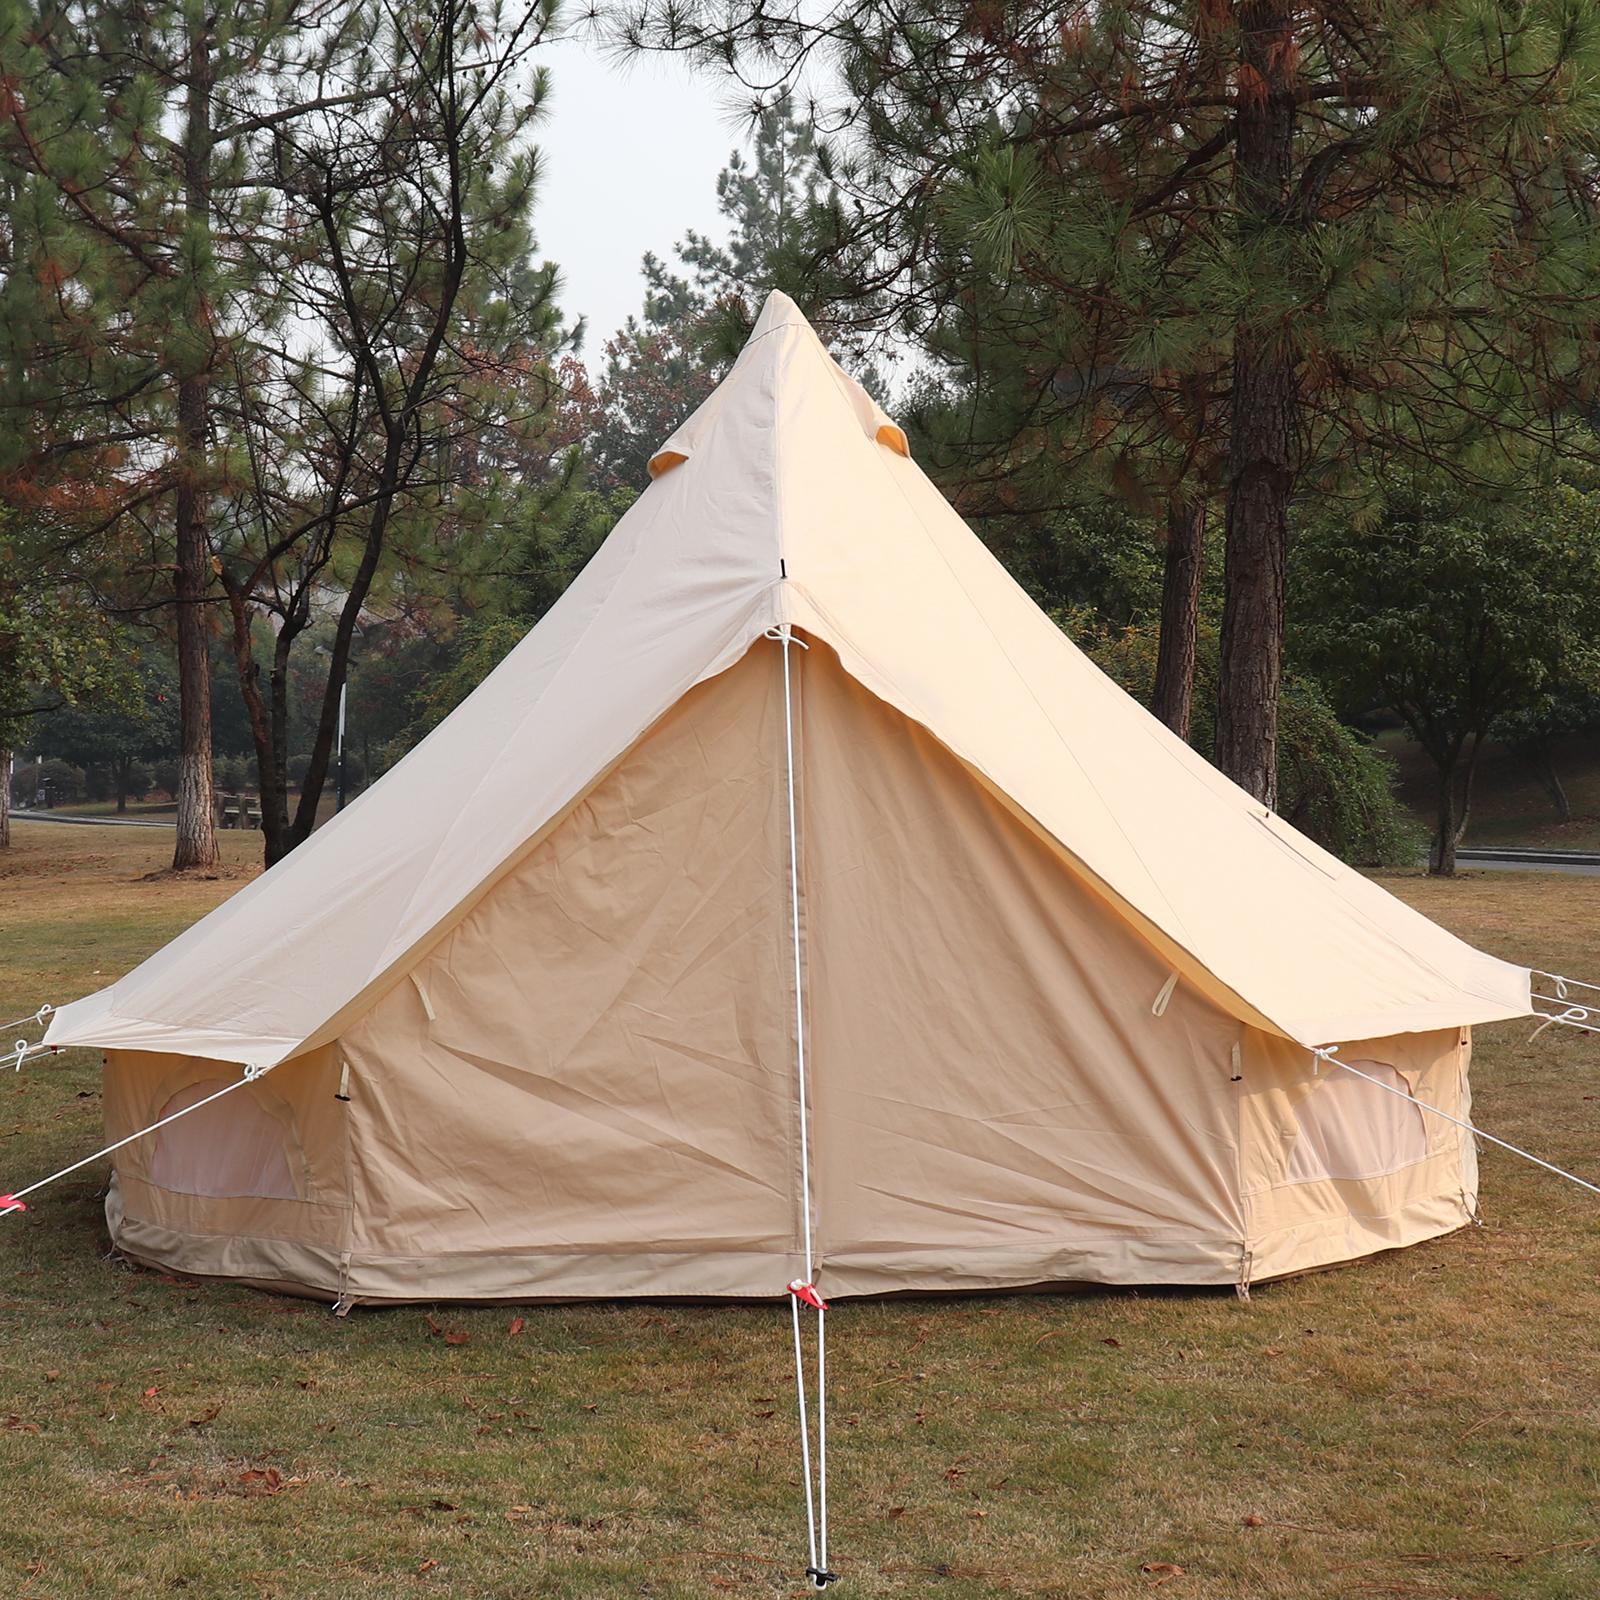 4-Season-Bell-Tent-3-4-5-6M-Waterproof-Cotton-Canvas-Glamping-Camping-Beach-US thumbnail 48